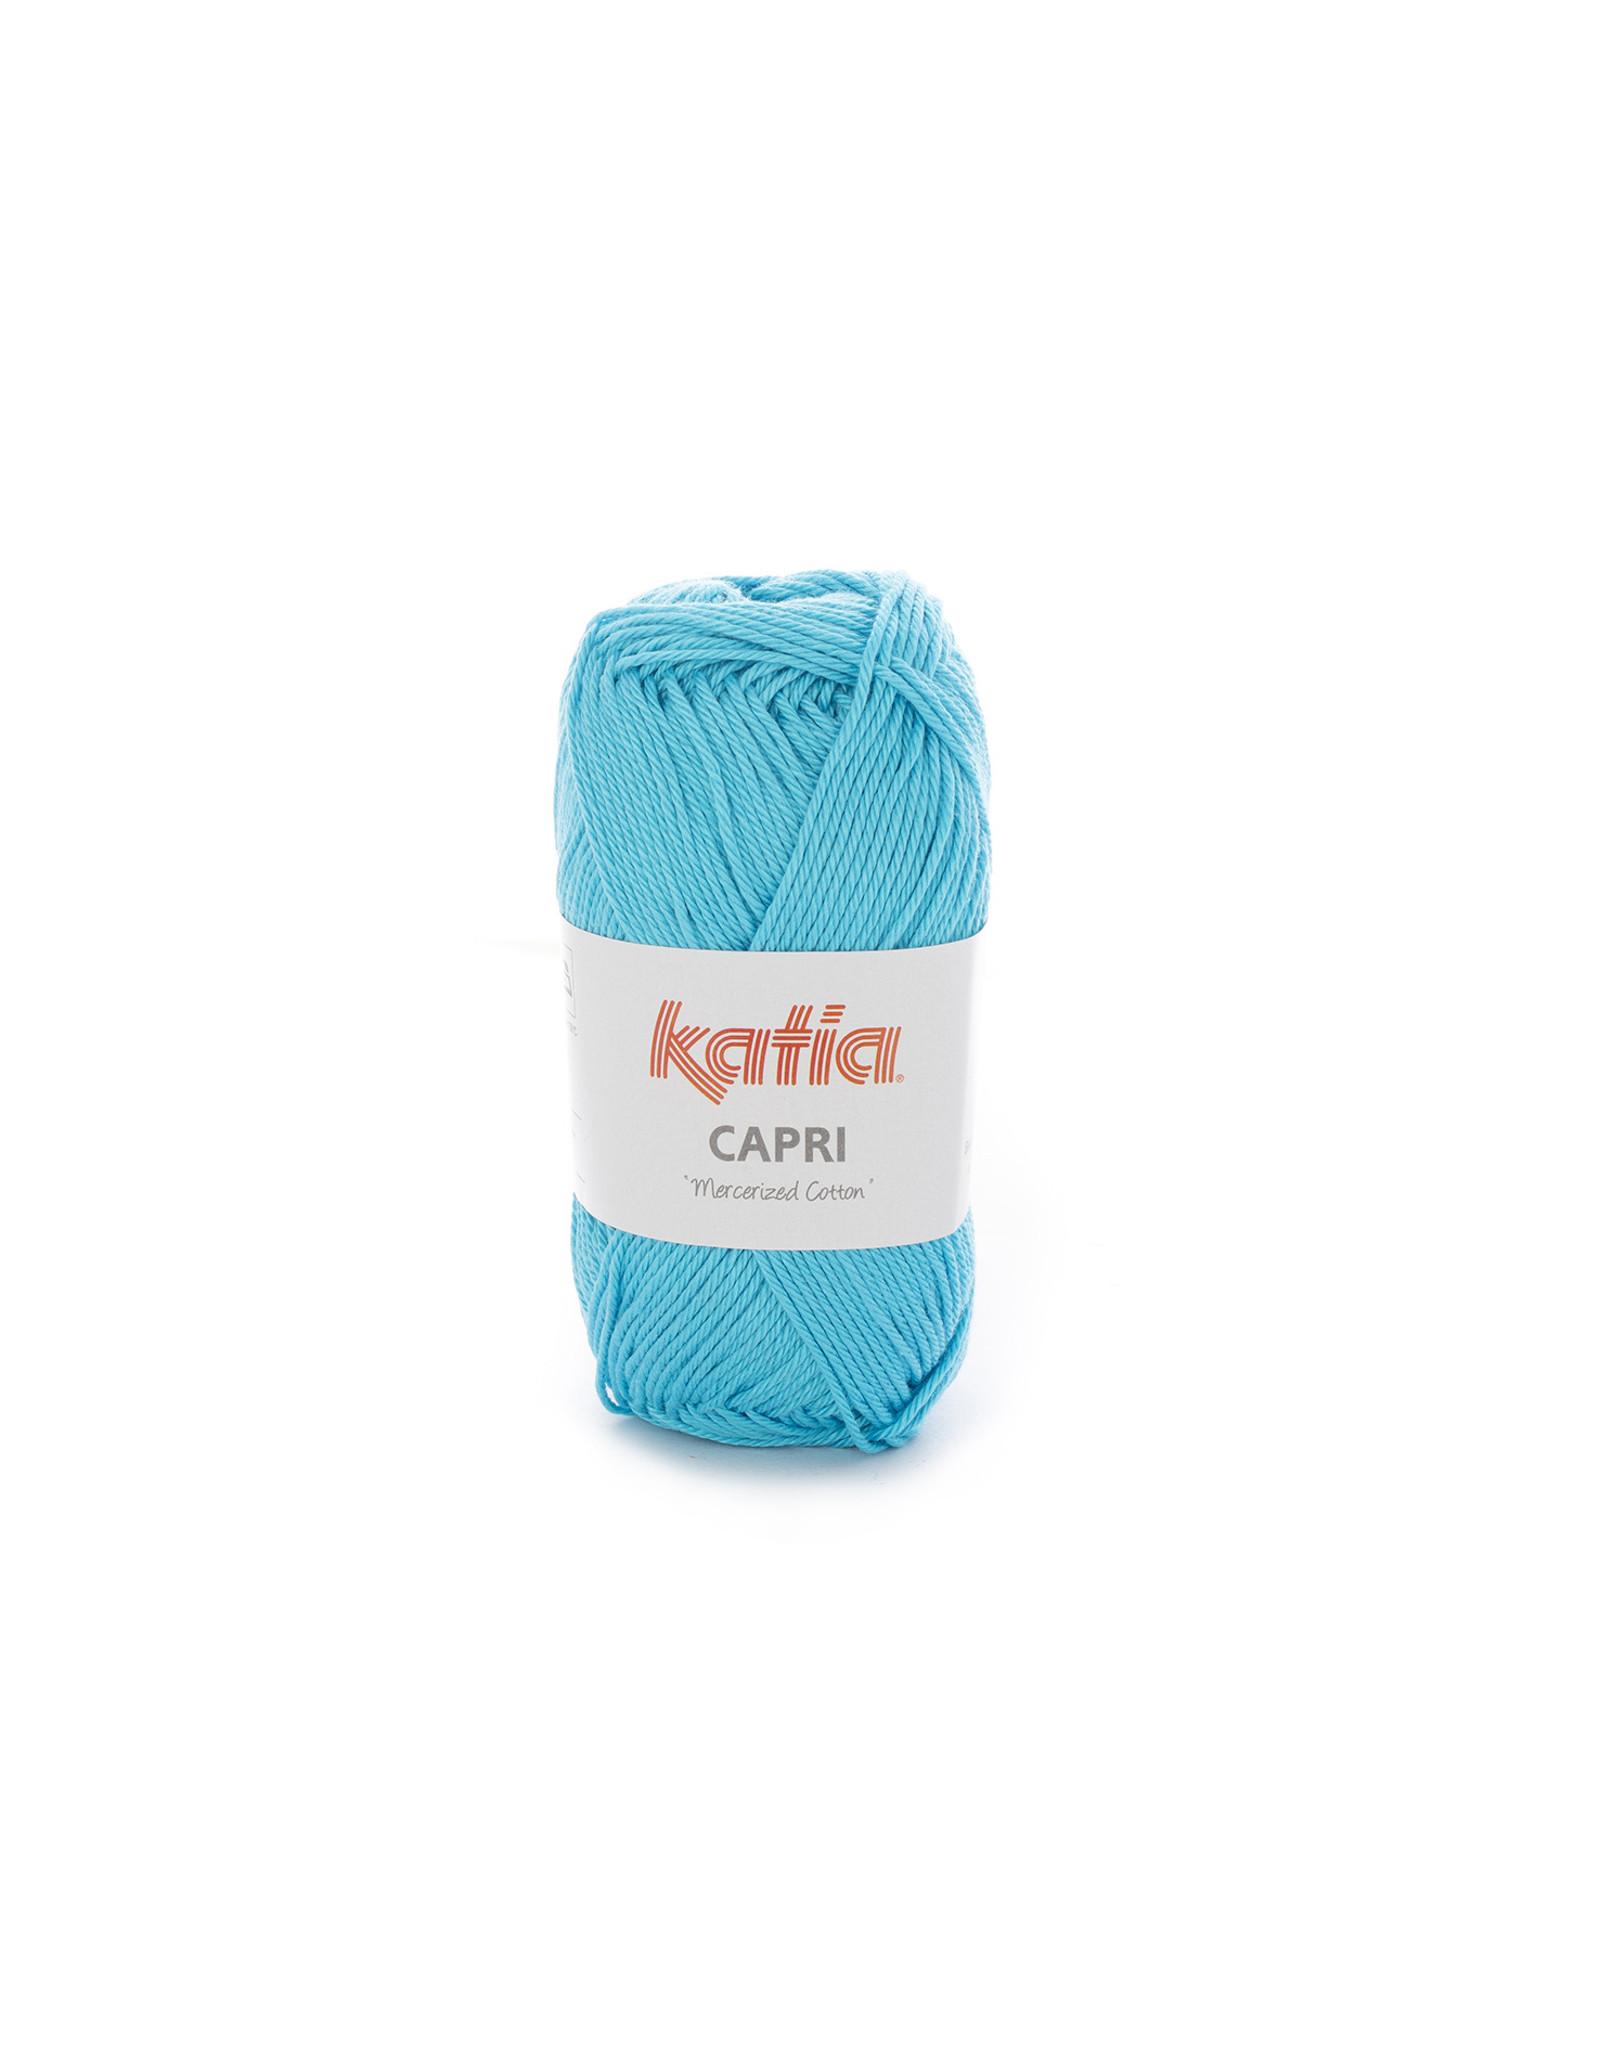 Katia Katia Capri - kleur 101 Turquoise - 50 gr. = 125 m. - 100% katoen